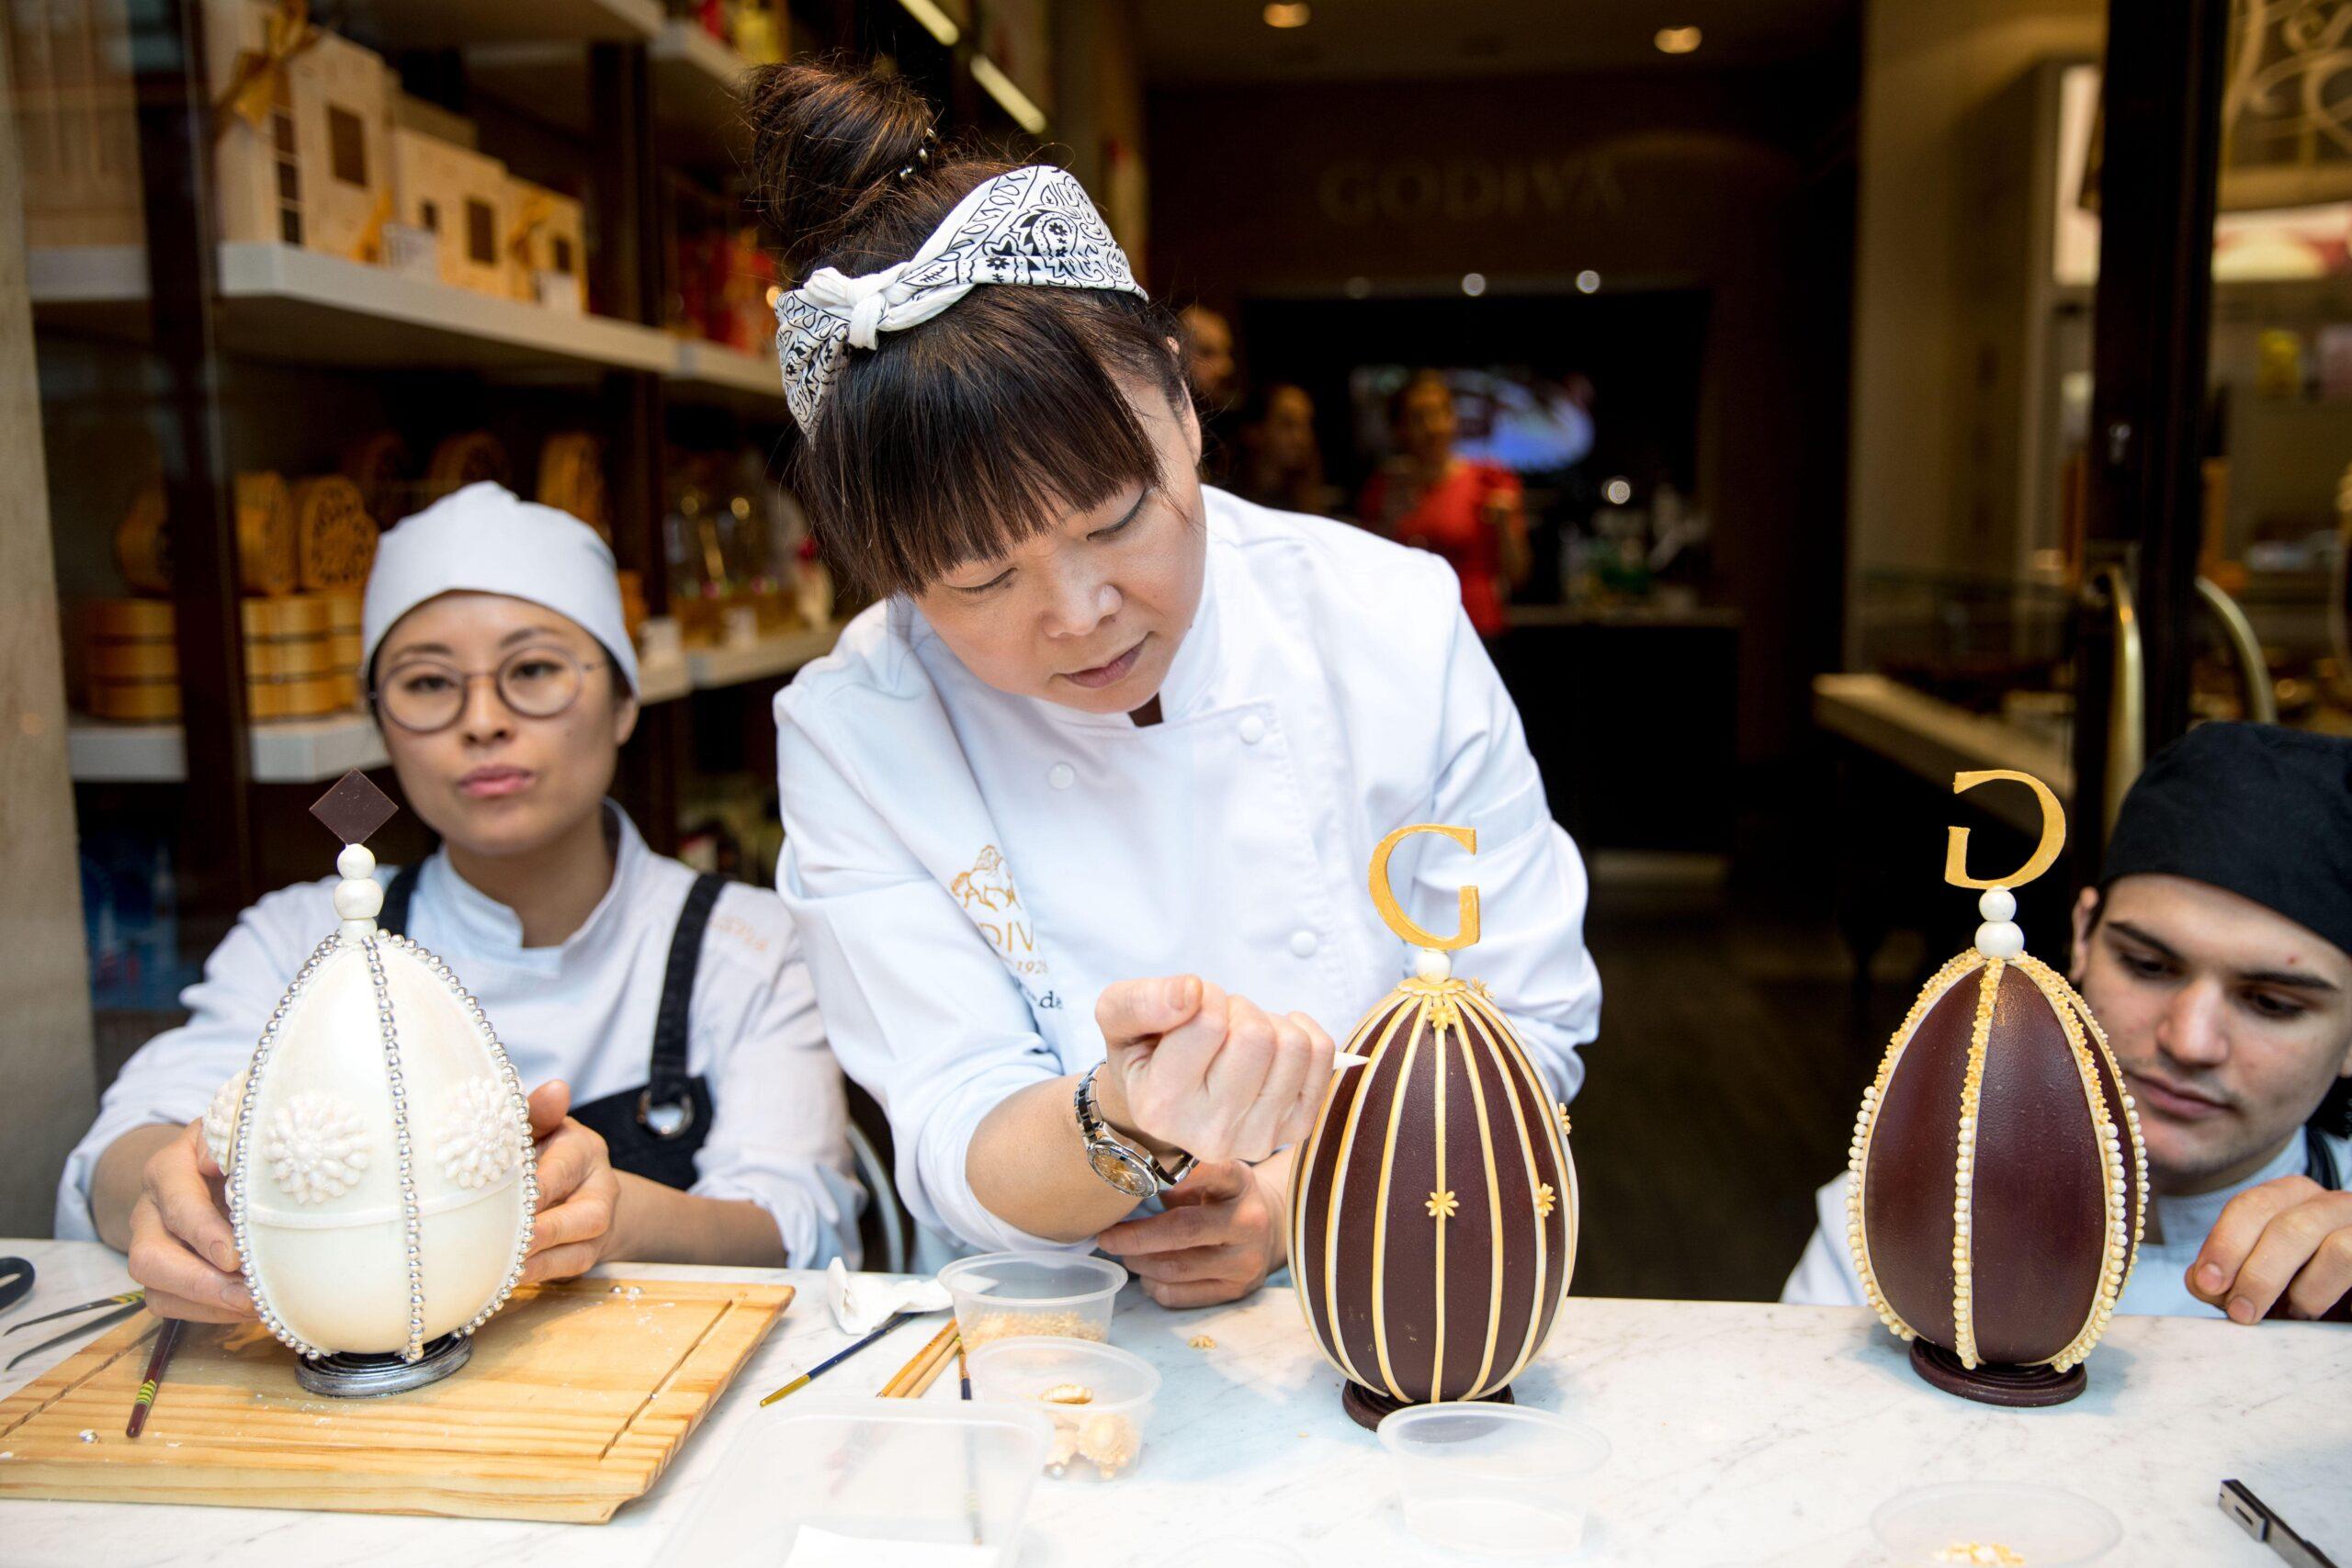 Cherish Finden executive pastry chef